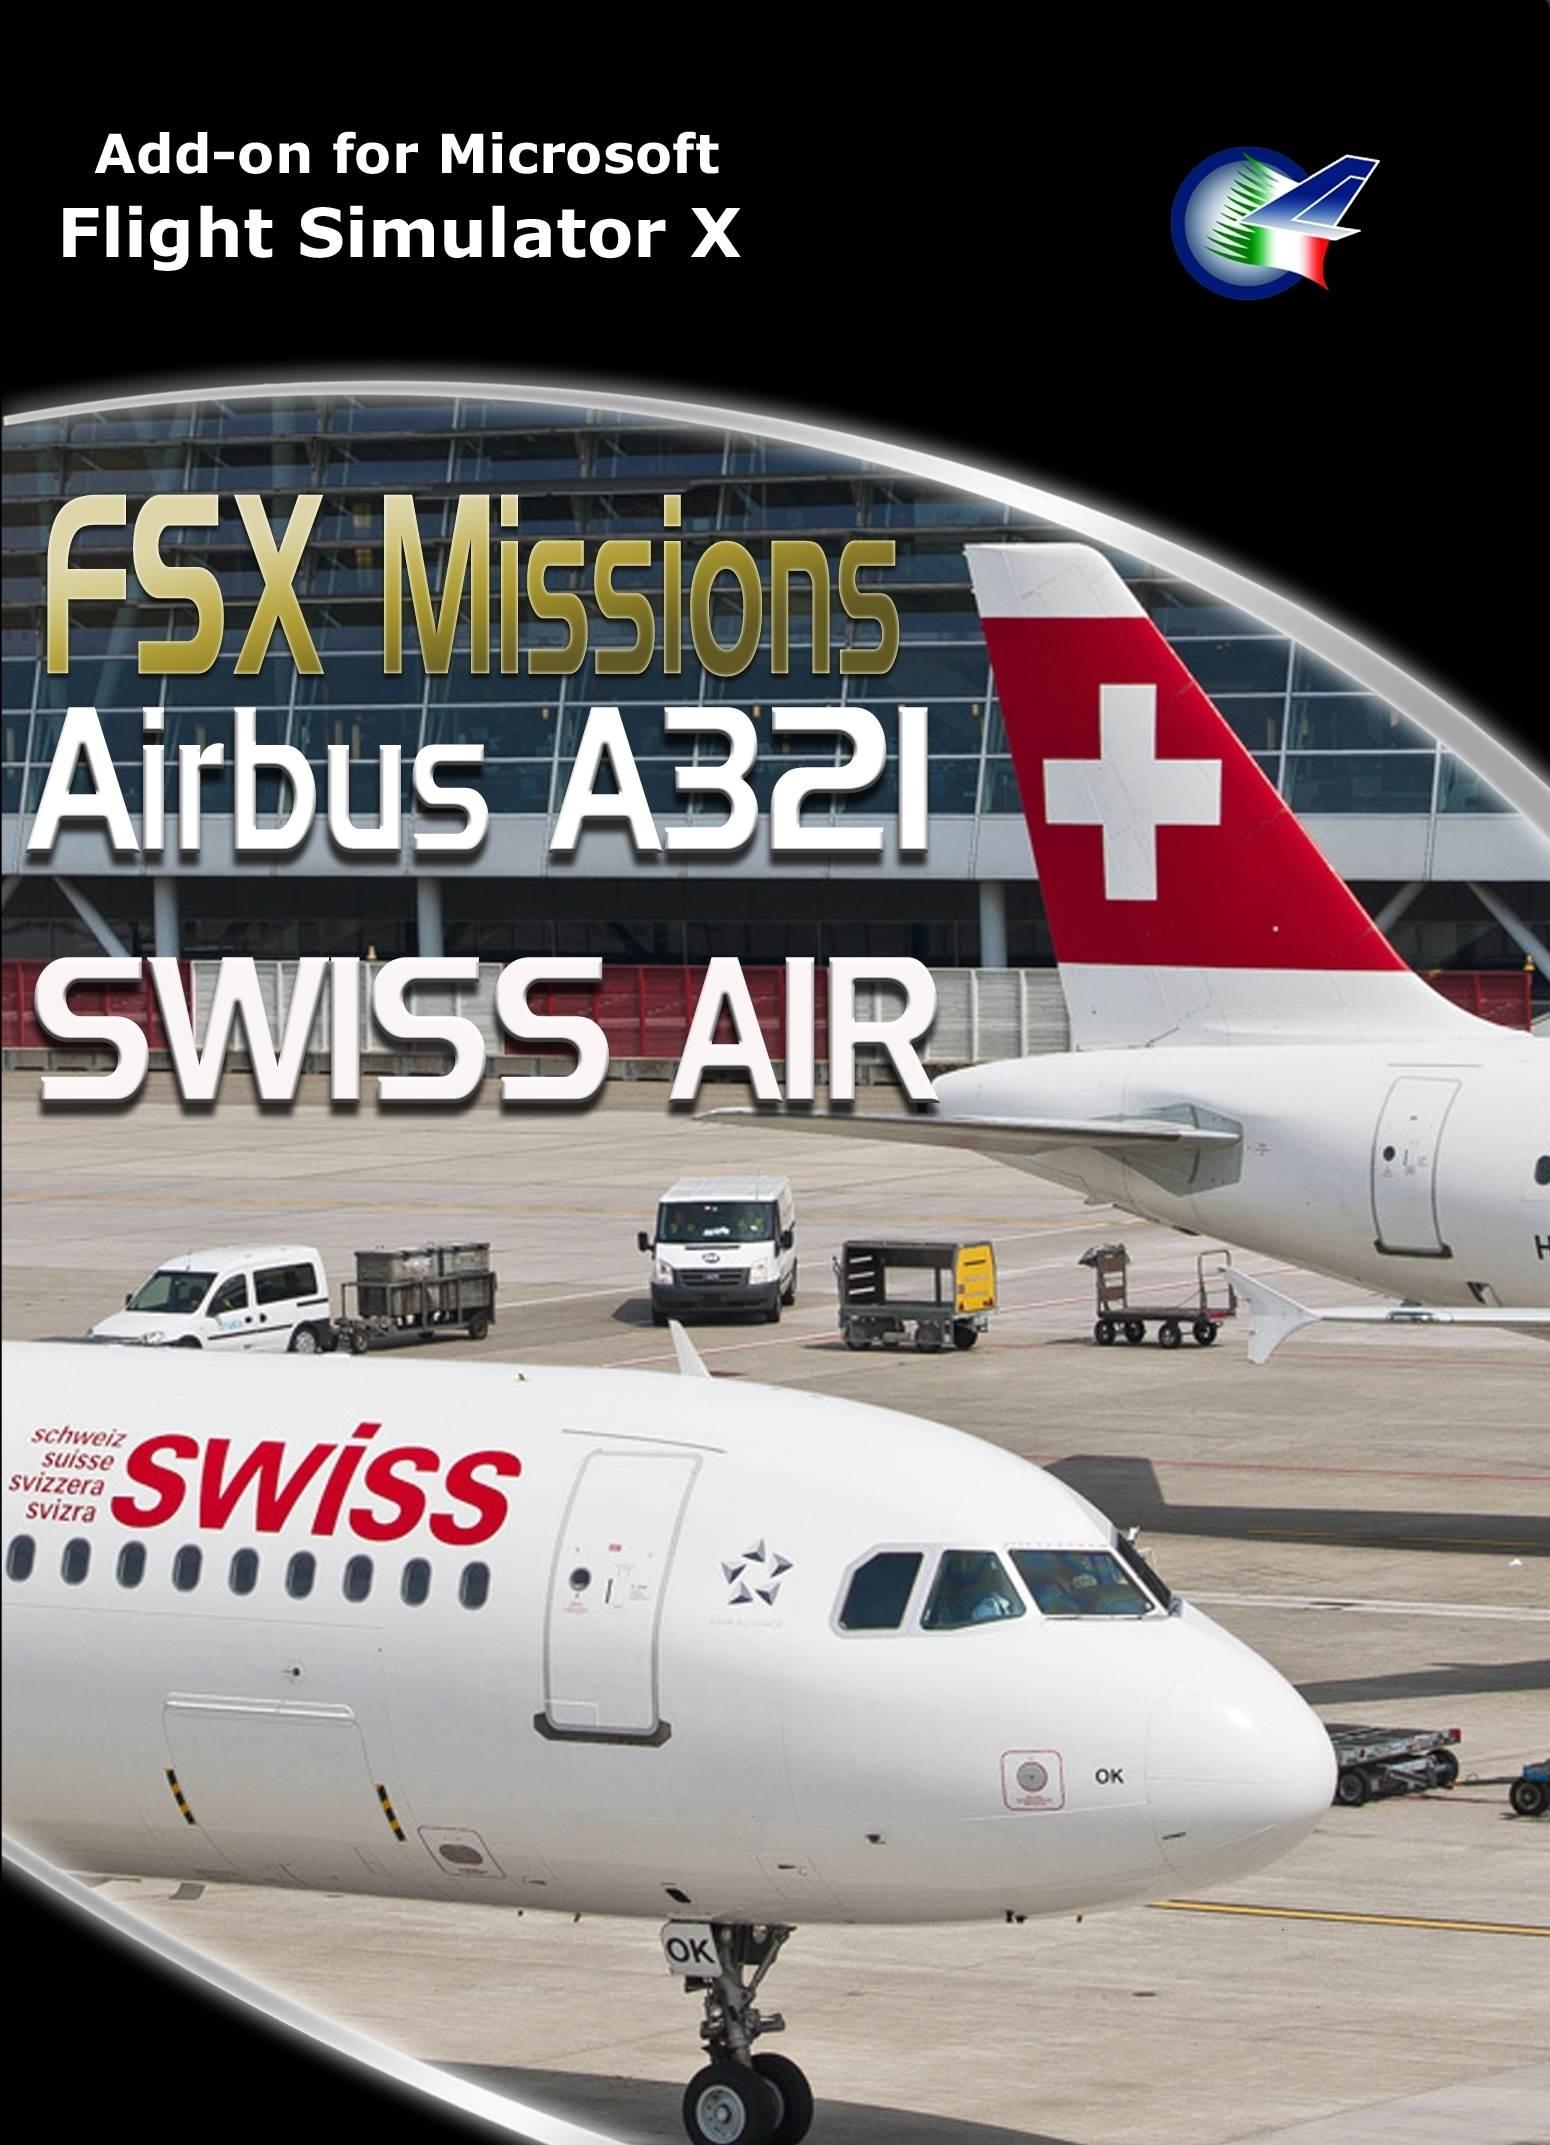 FSX Missions Airbus A321 Swiss Air